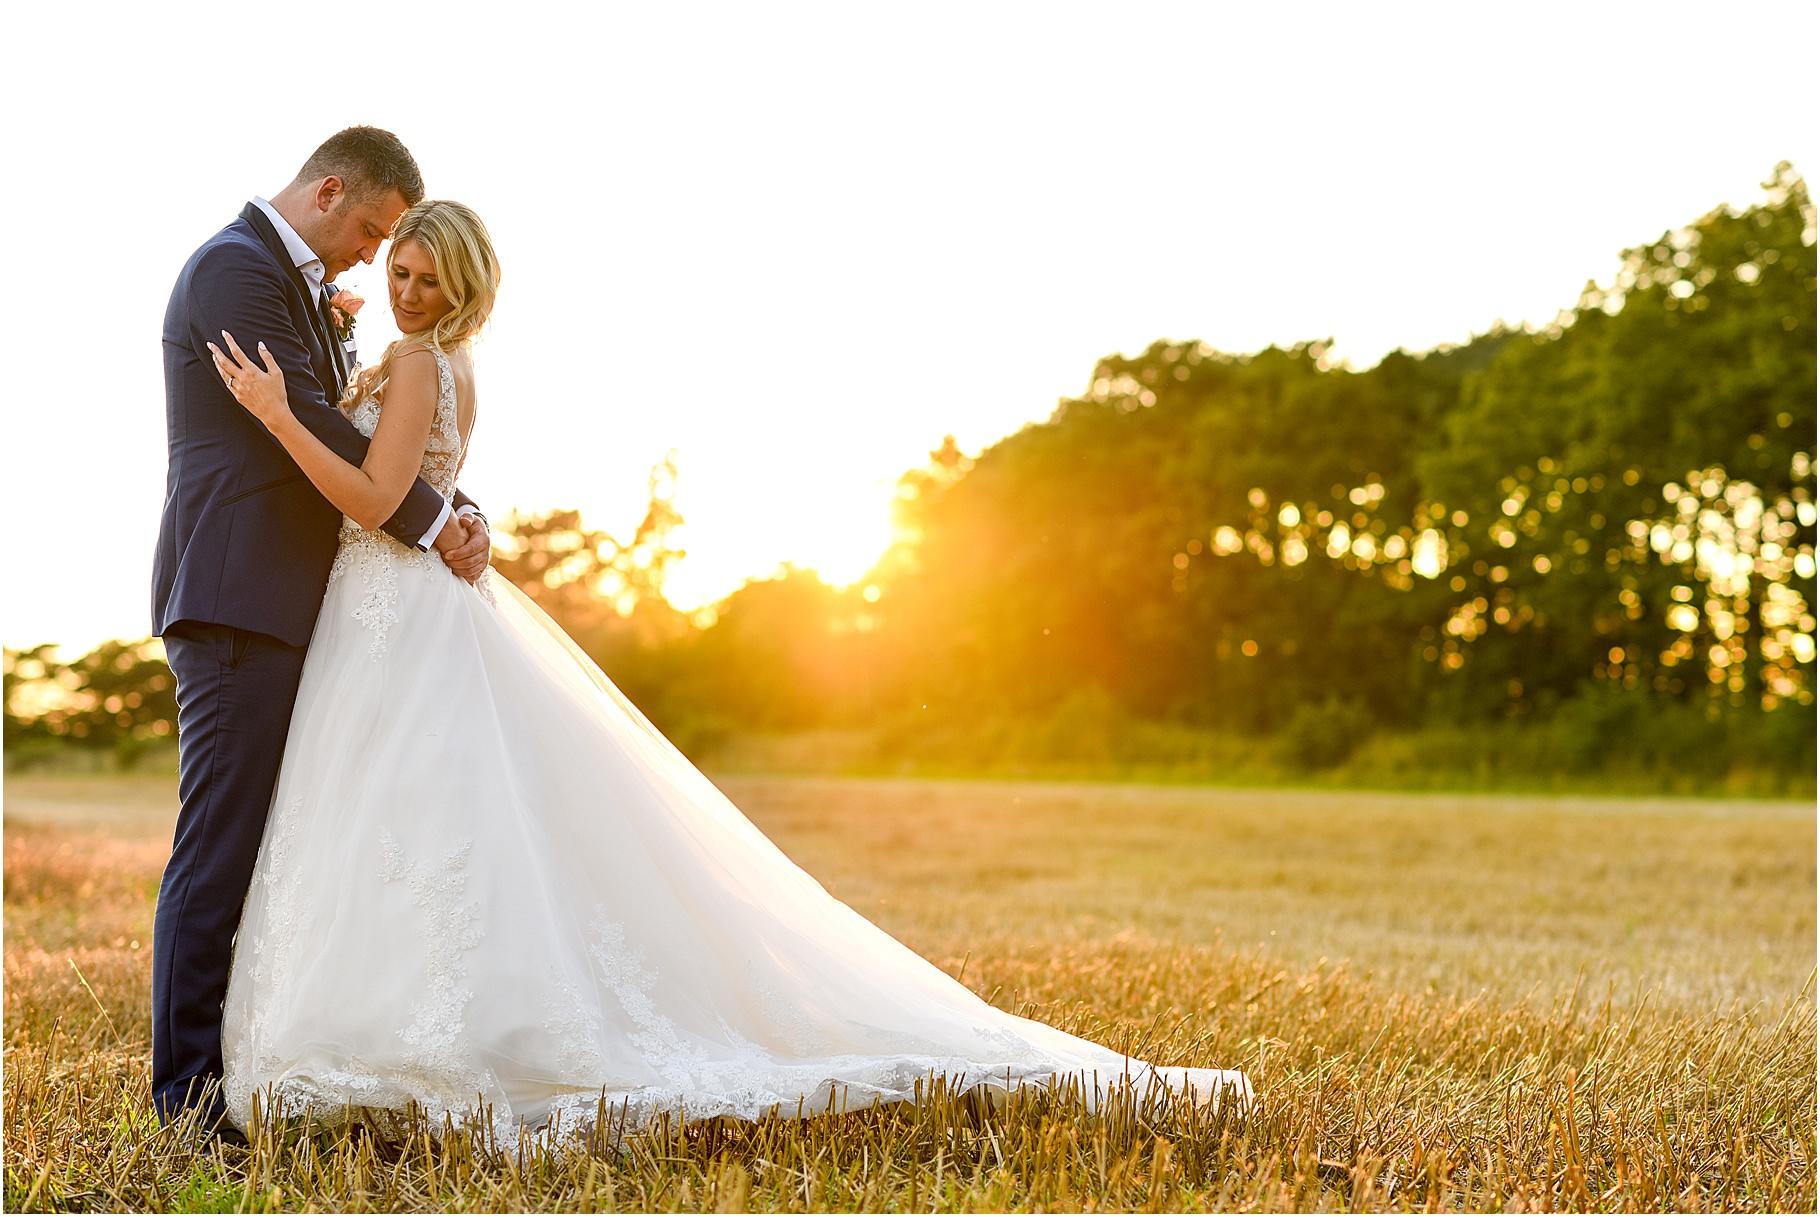 the-villa-wrea-green-wedding-64.jpg